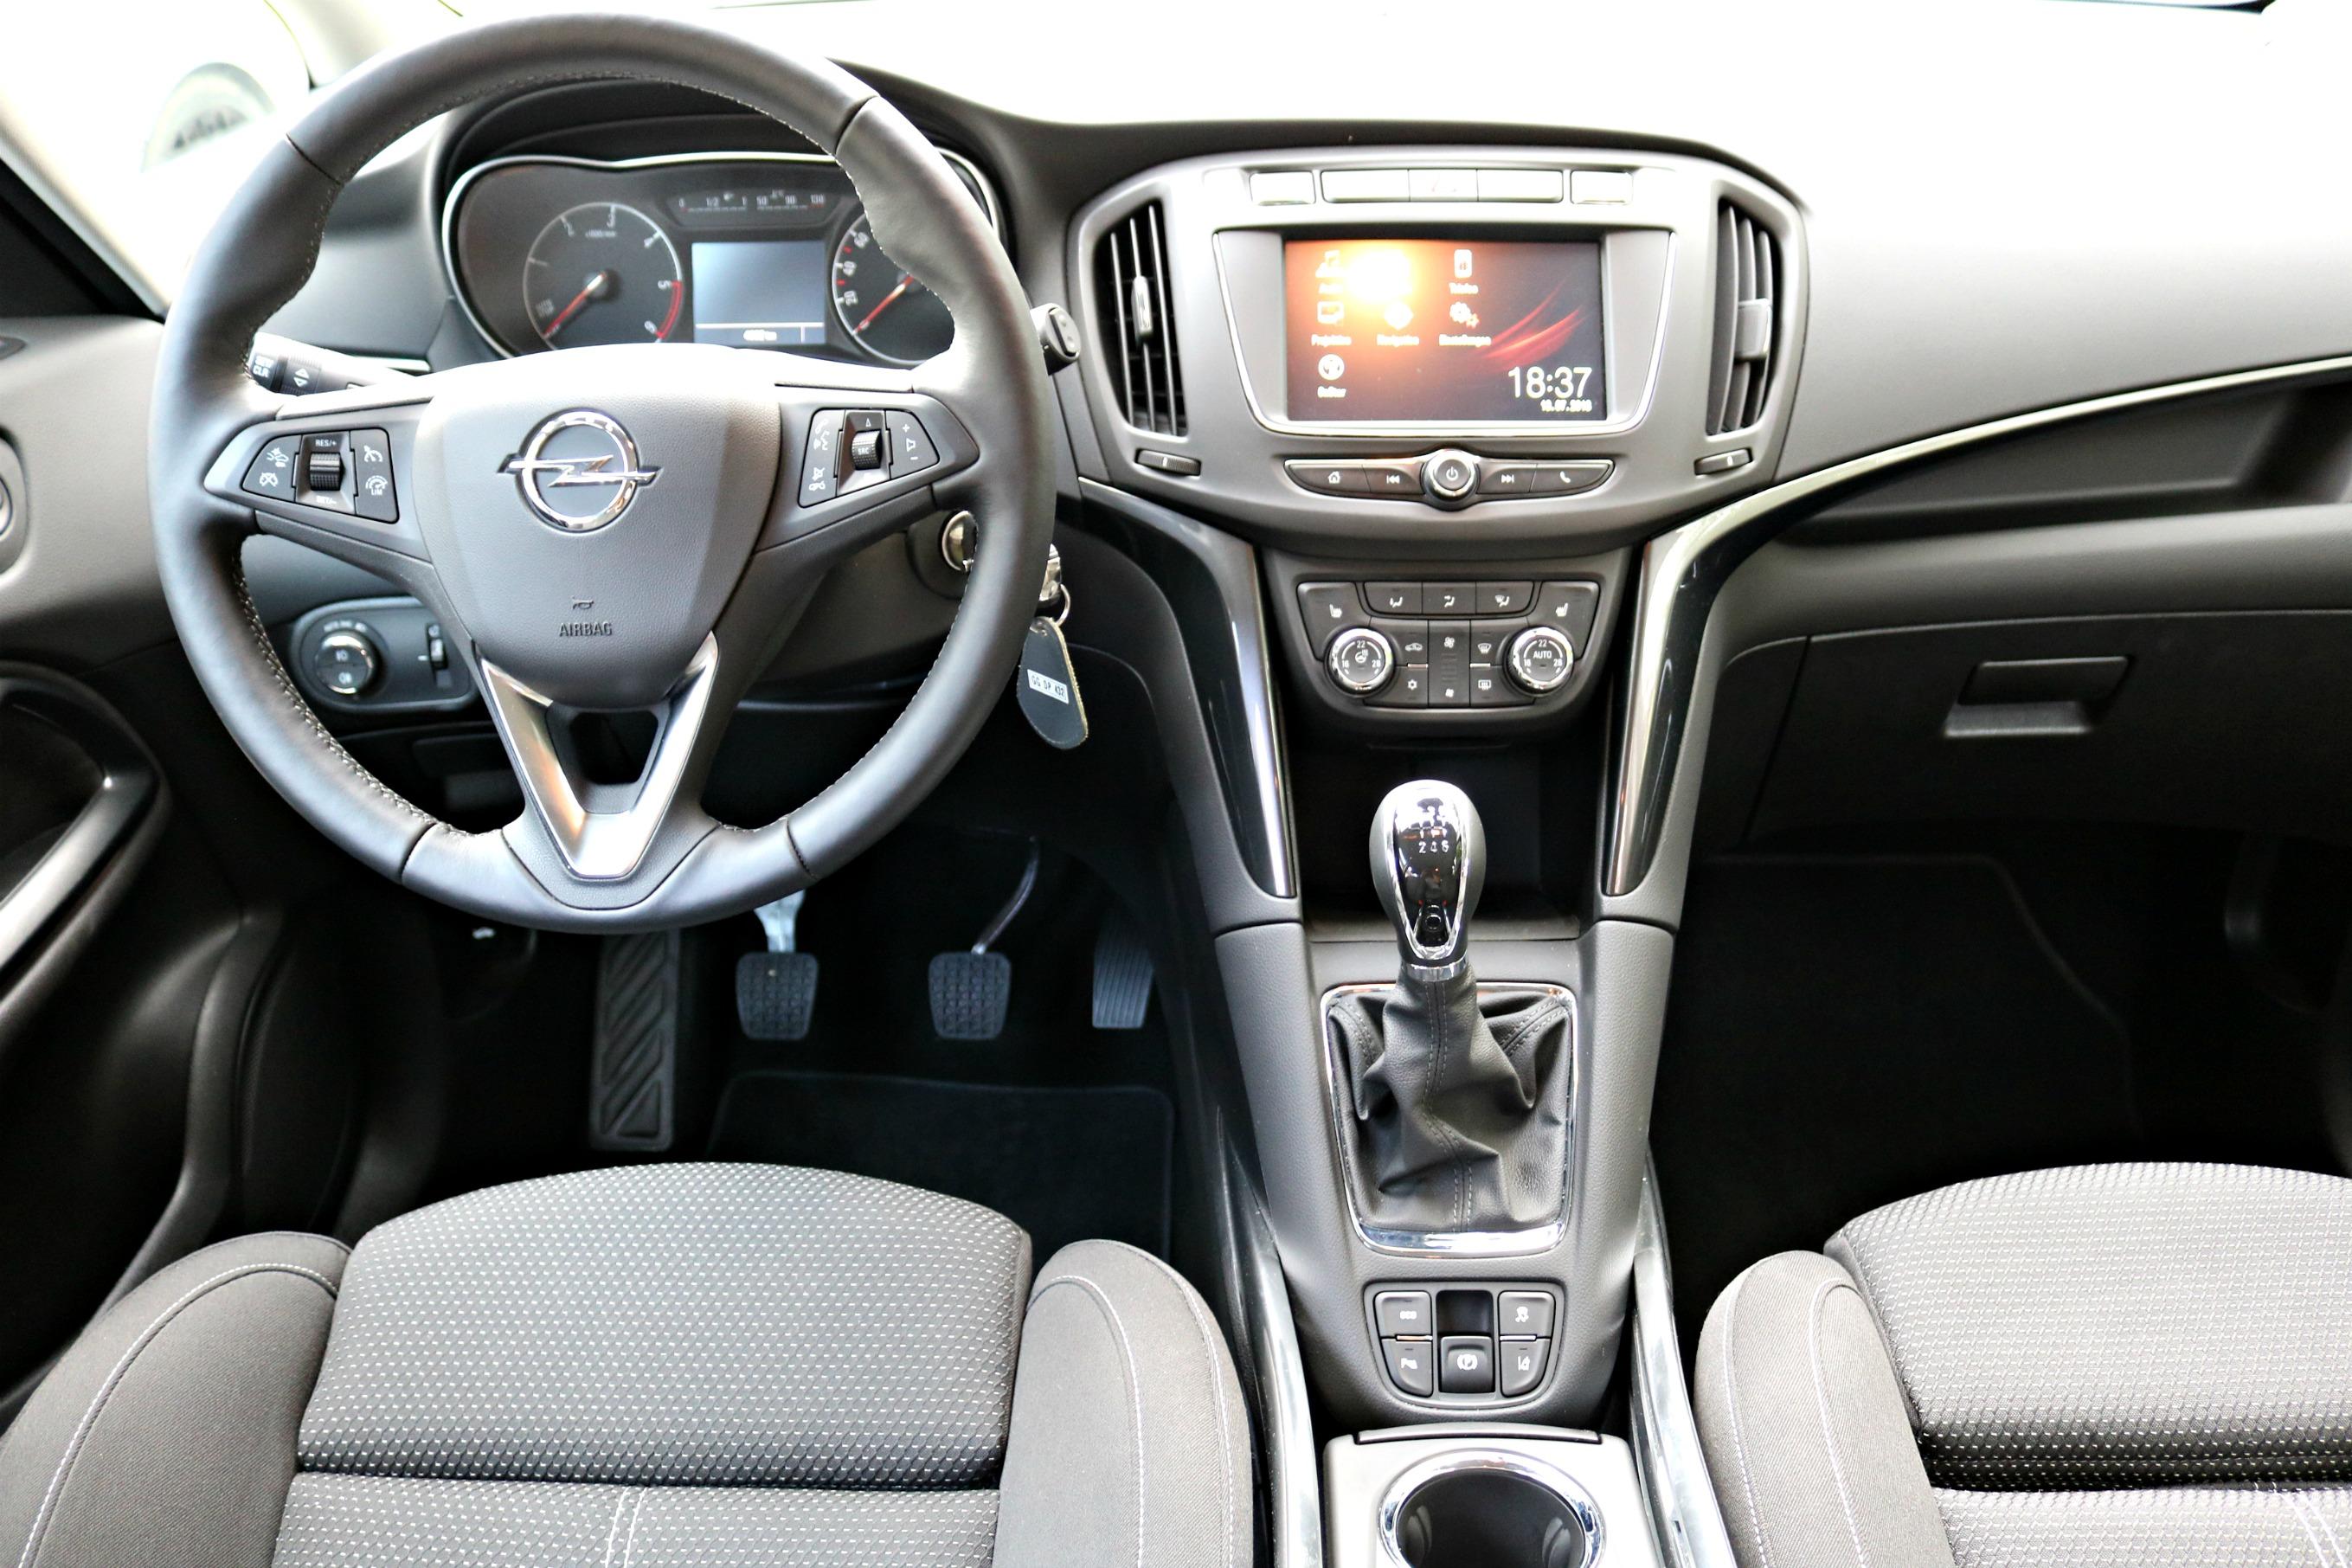 Opel_Zafira_Innenausstattung